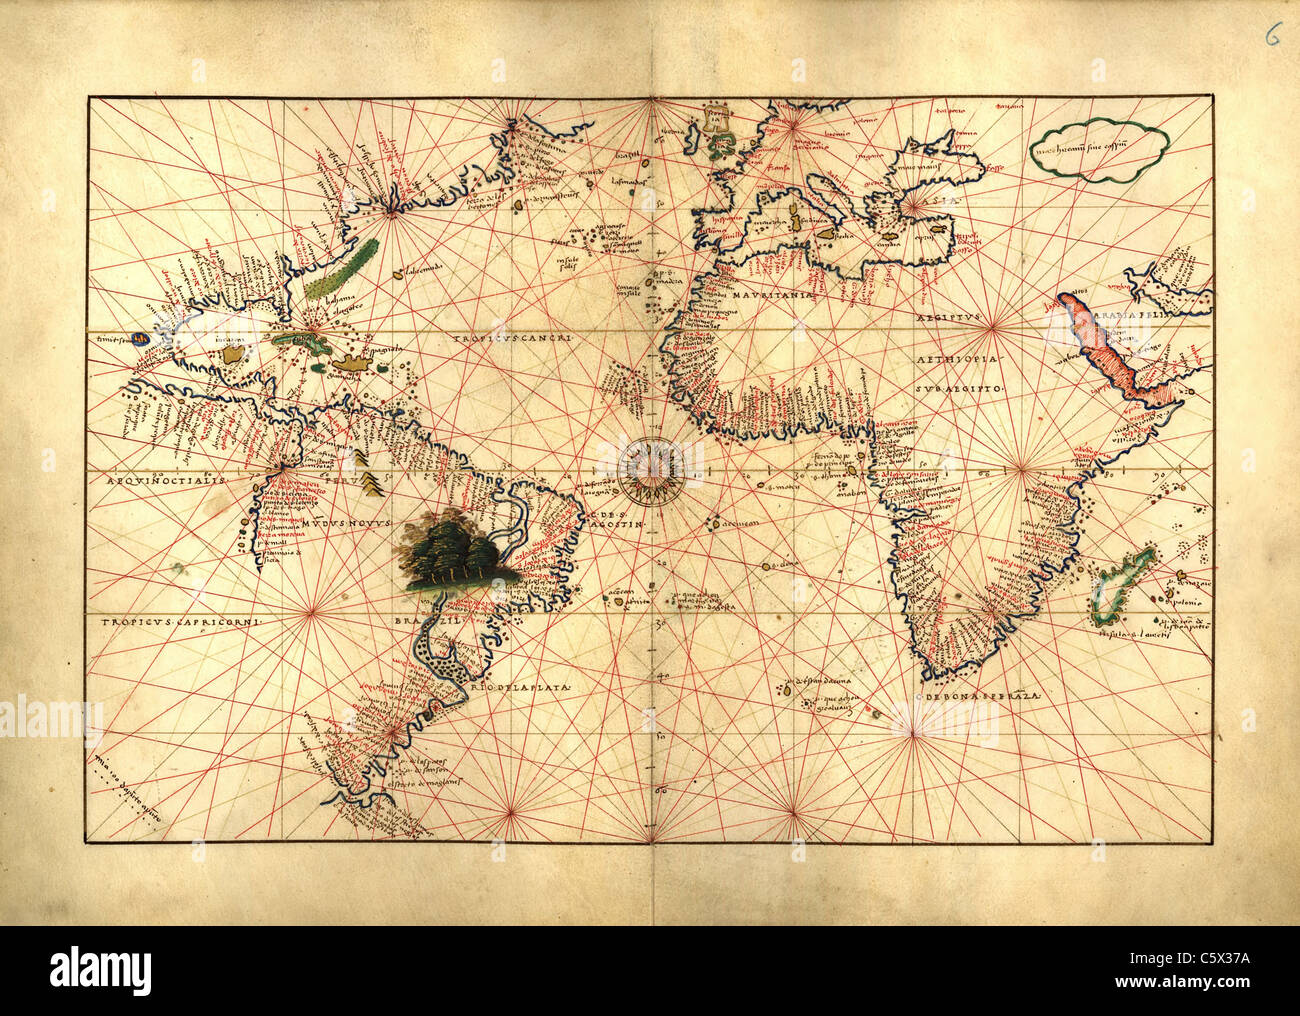 Atlantic Ocean - Antiquarian Map or Portolan Chart from 16th Century Portolan Atlas Stock Photo